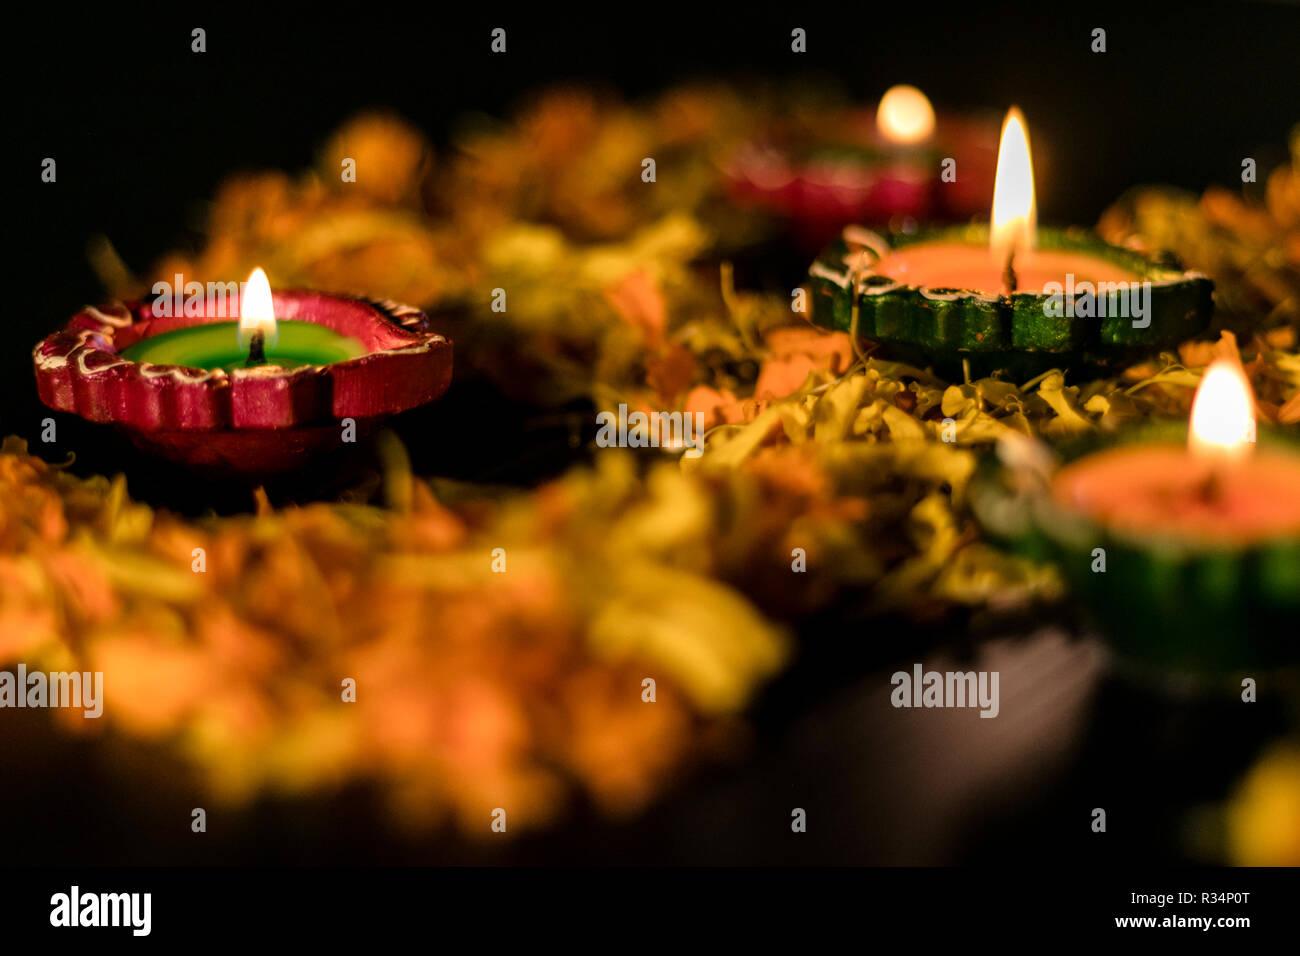 Diya placed on swastik for celebrating diwali and dhanteras in Asia Stock Photo